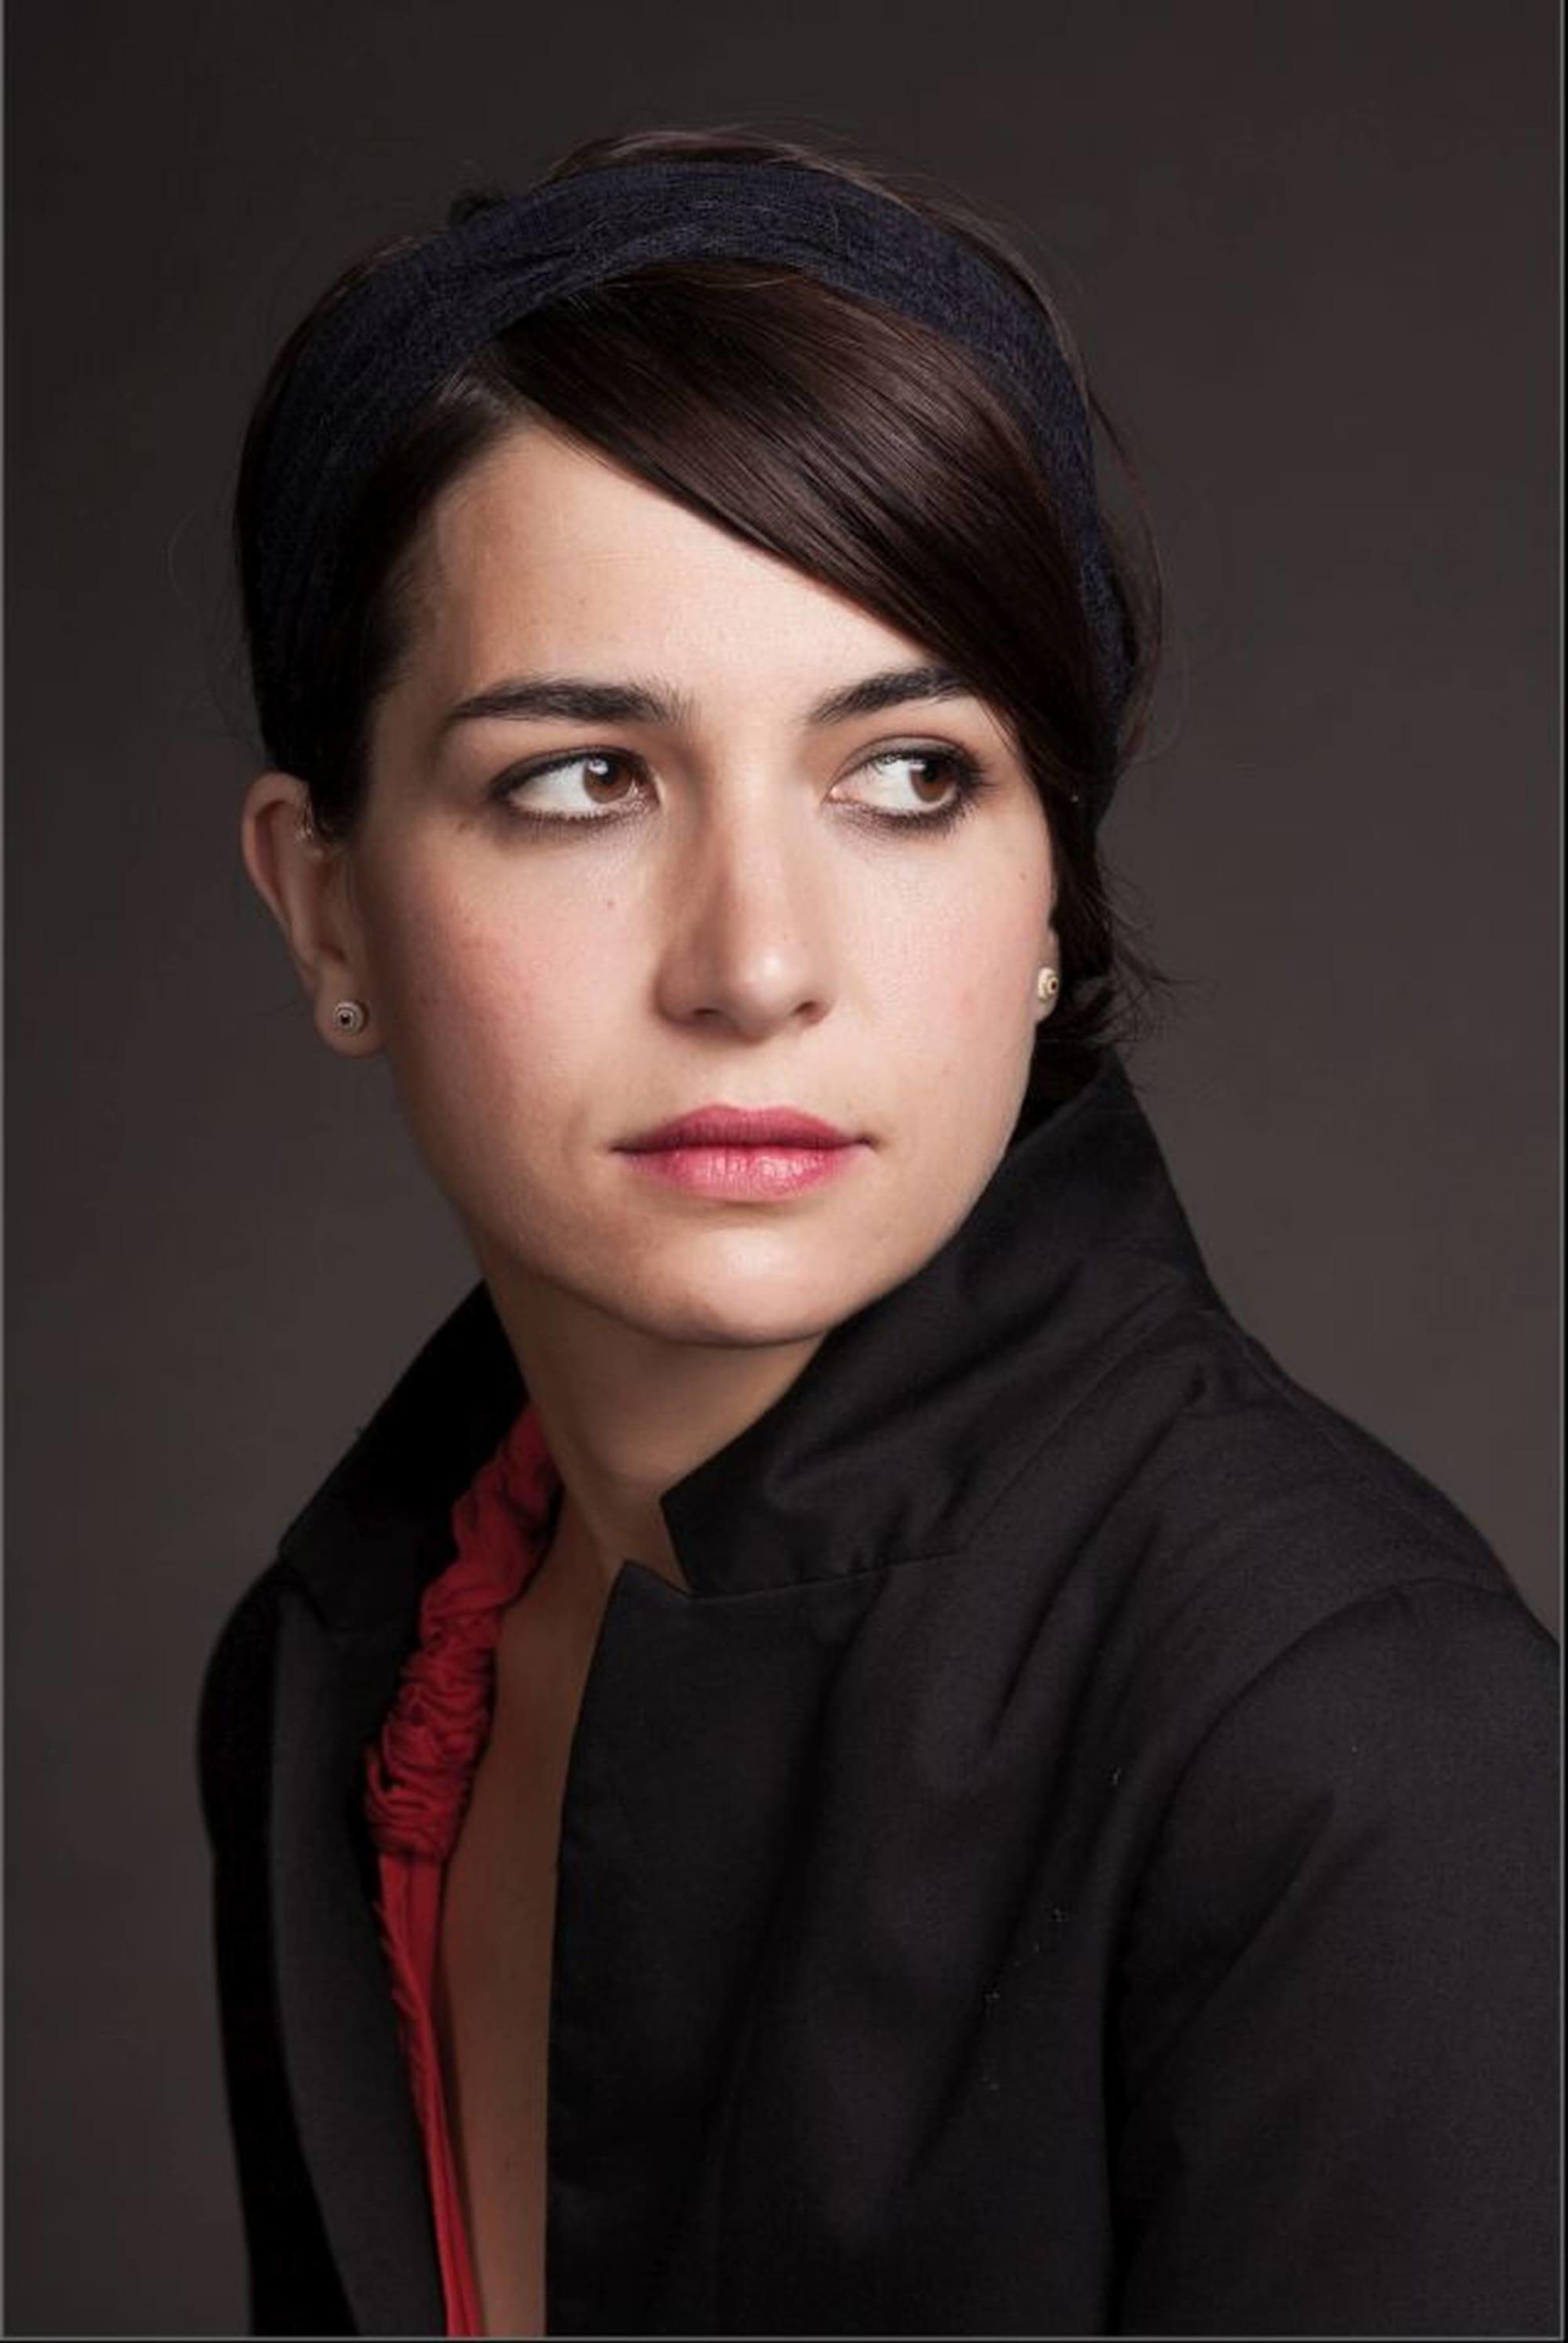 Ioana Iacob